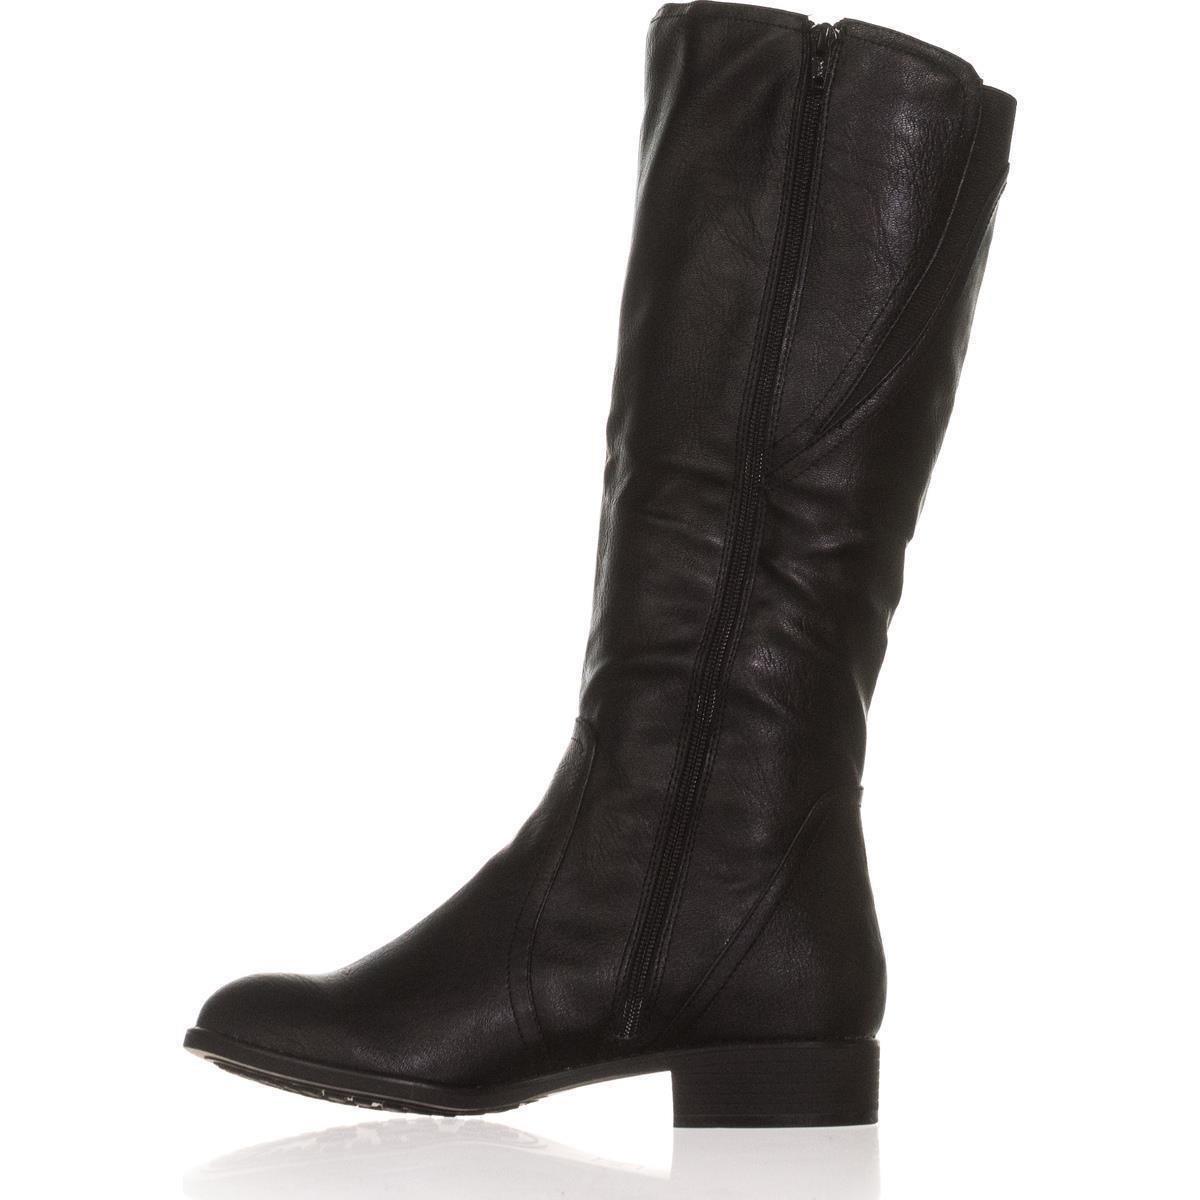 Style & Co. Frauen Milah Geschlossener Zeh Zeh Zeh Fashion Stiefel 231f00